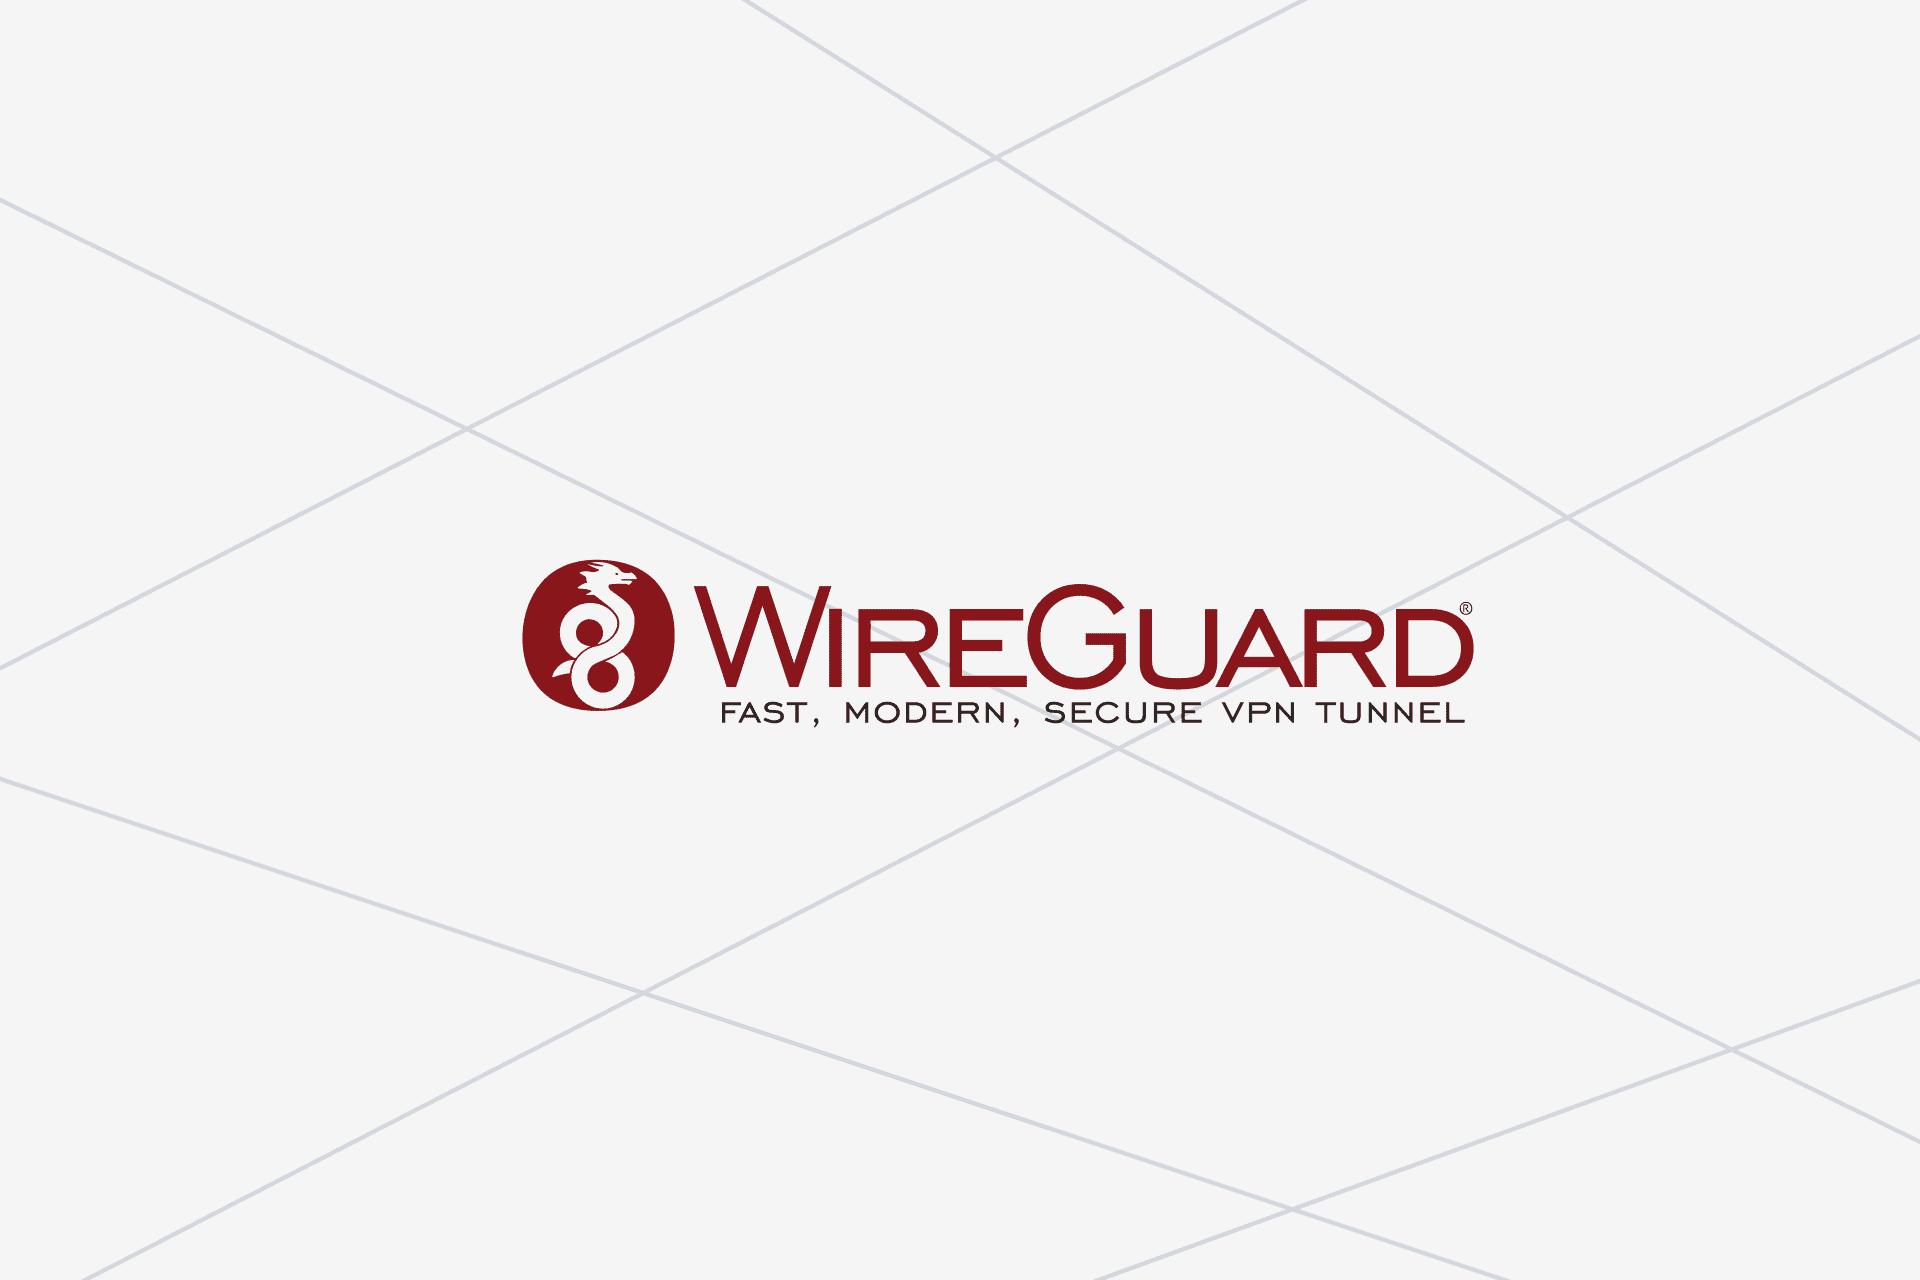 wireguard server windows